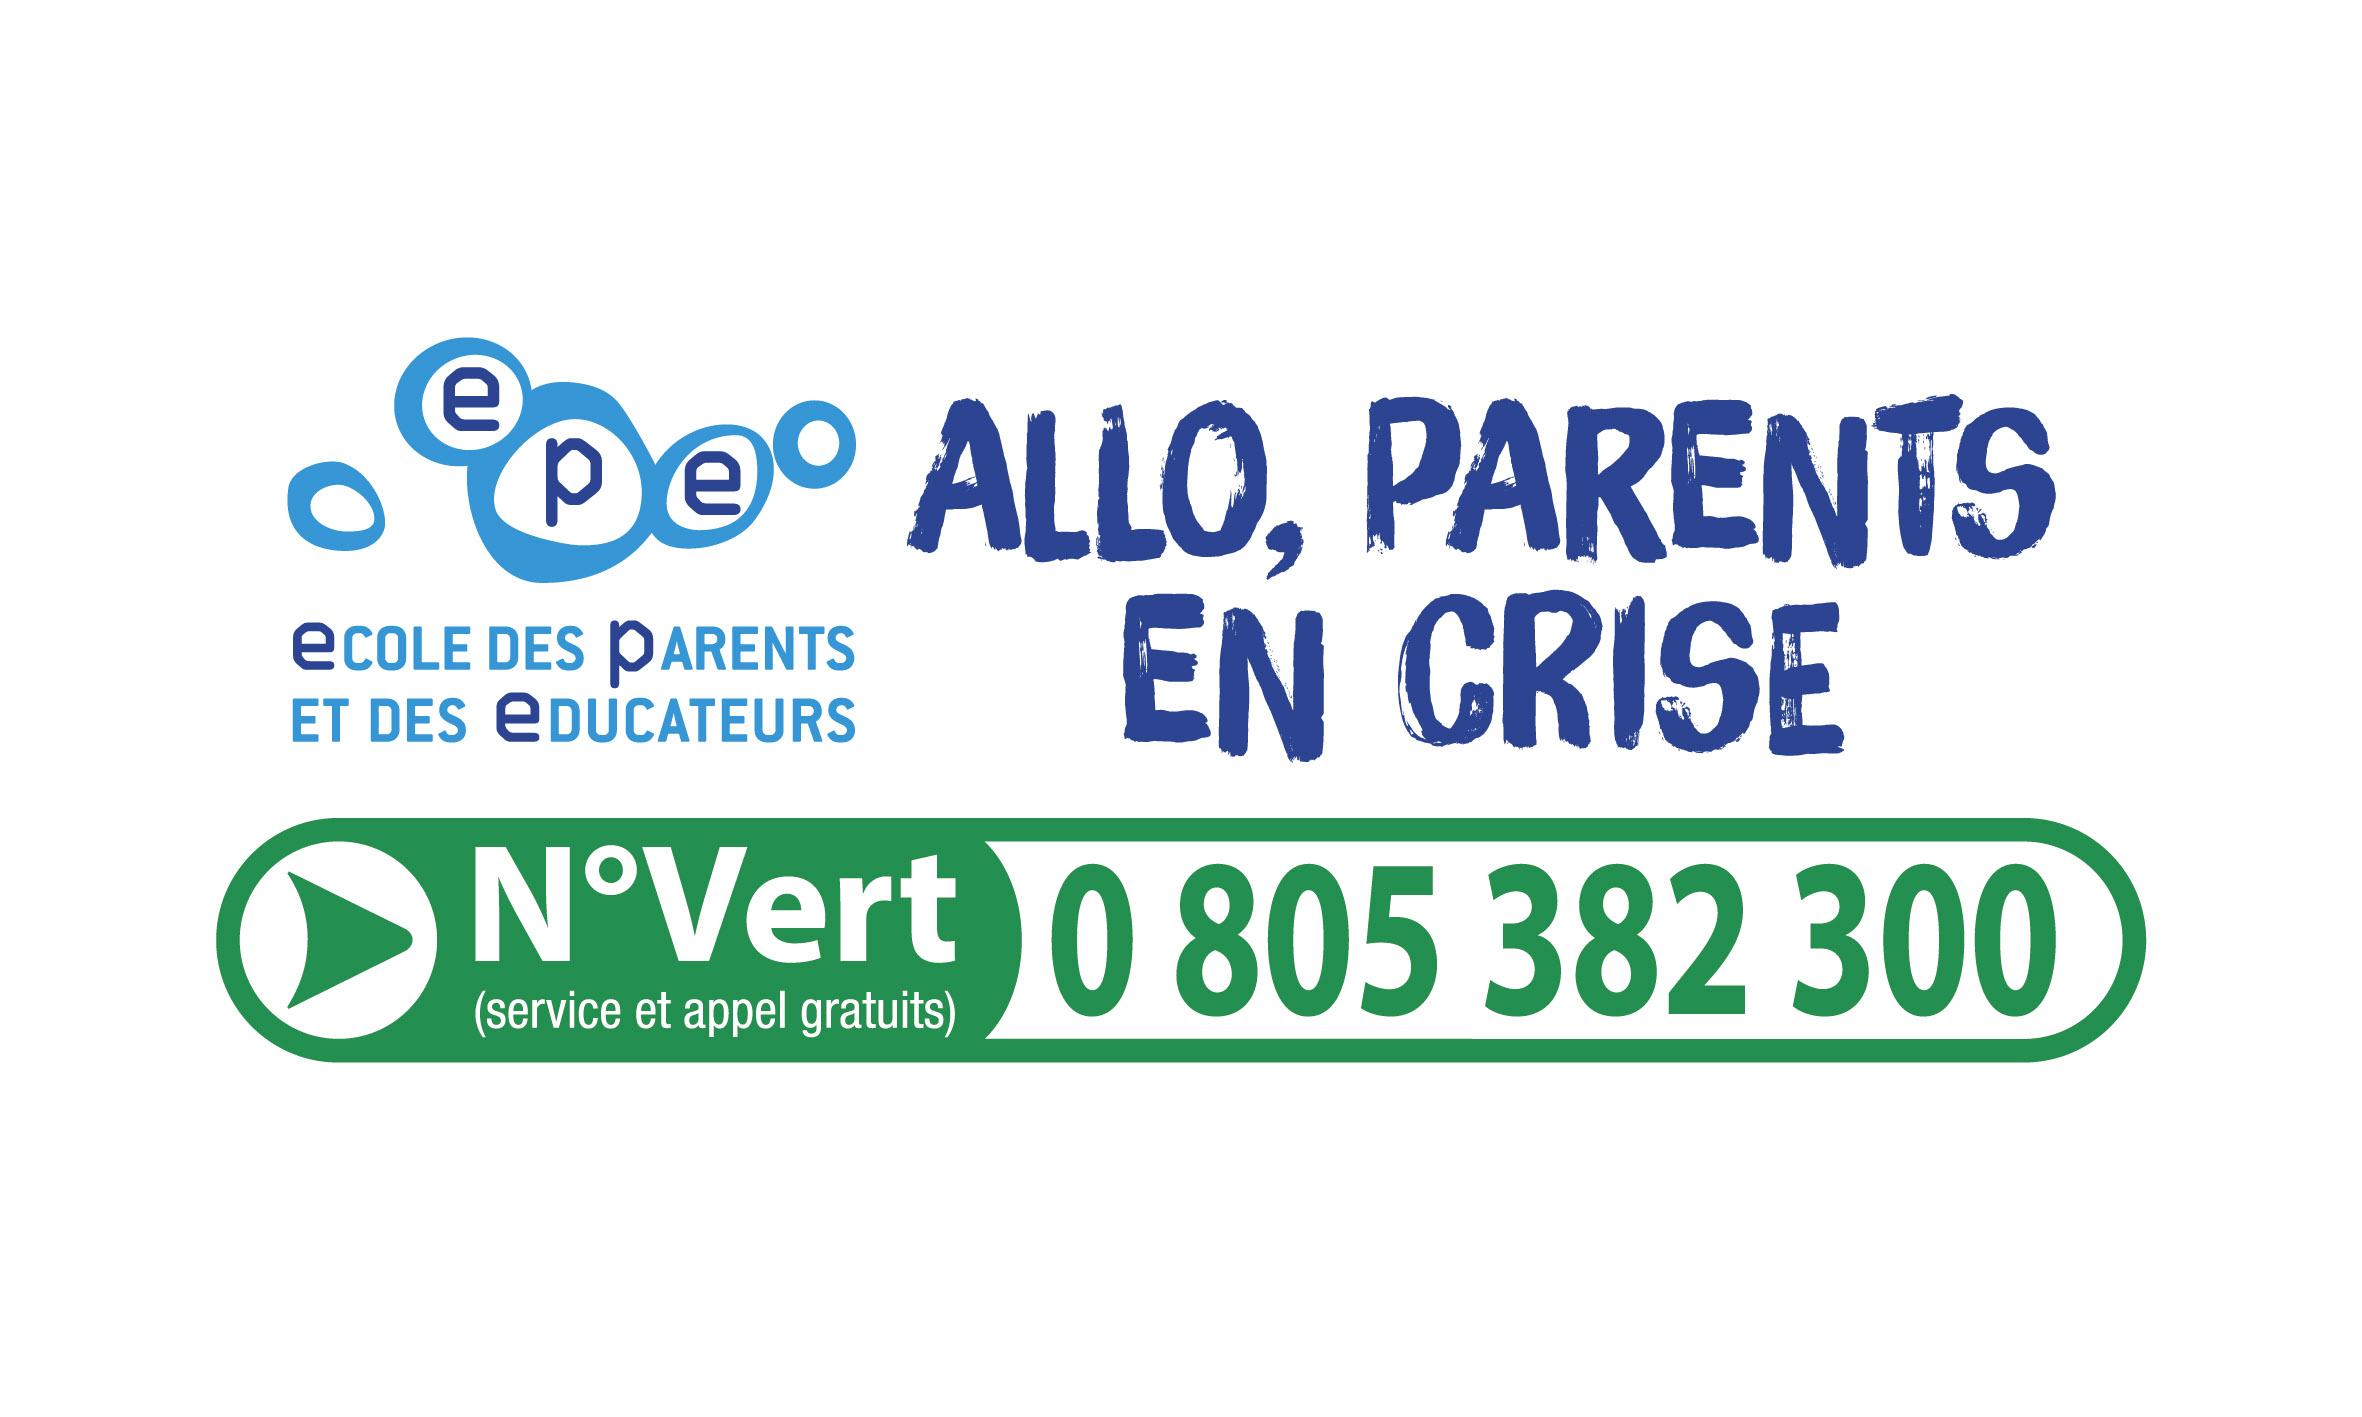 PICTO-N_Vert_Allo-Parents-en-crise.jpg